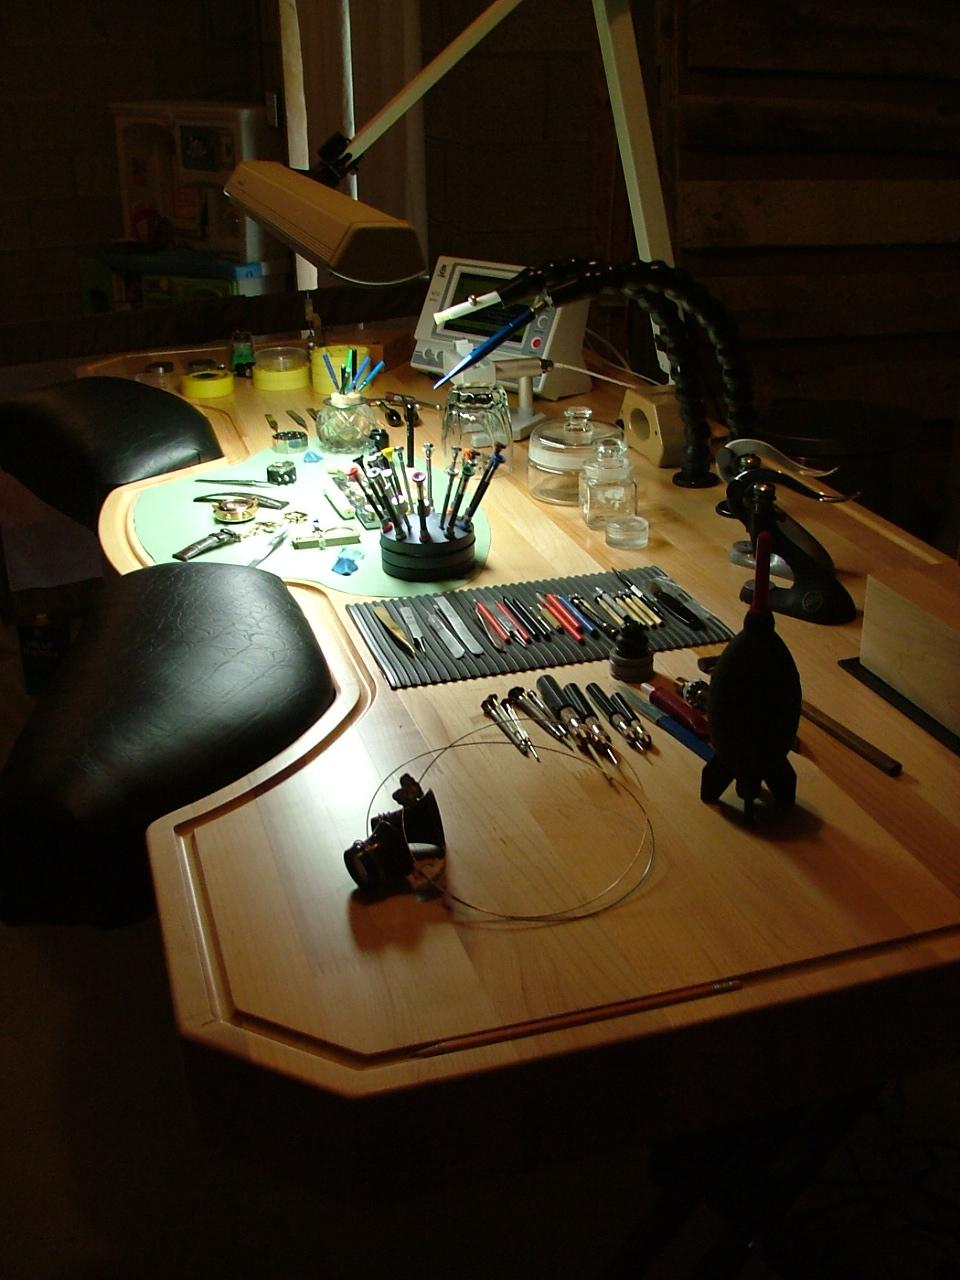 Official Site Of Dan Spitz: watchmakers bench